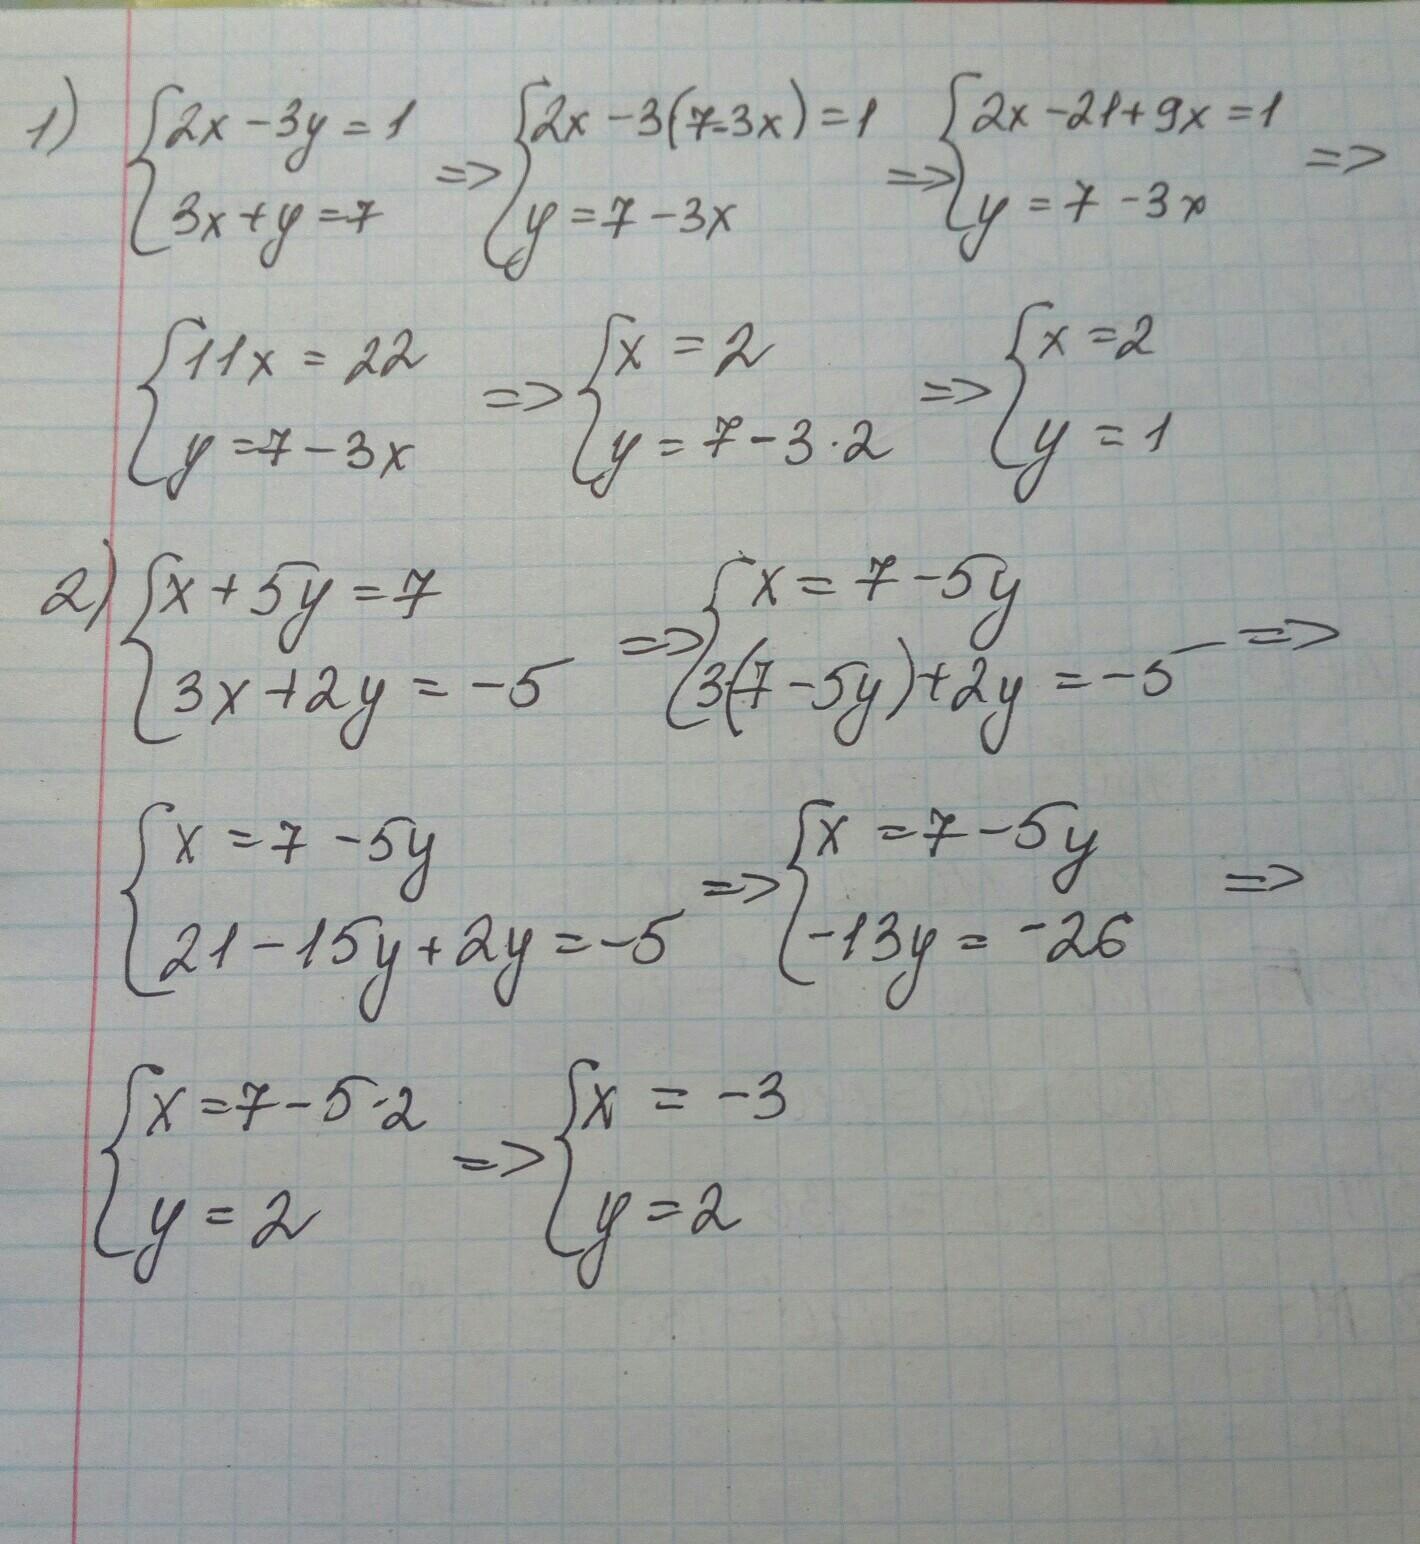 Решите систему уравнений методом